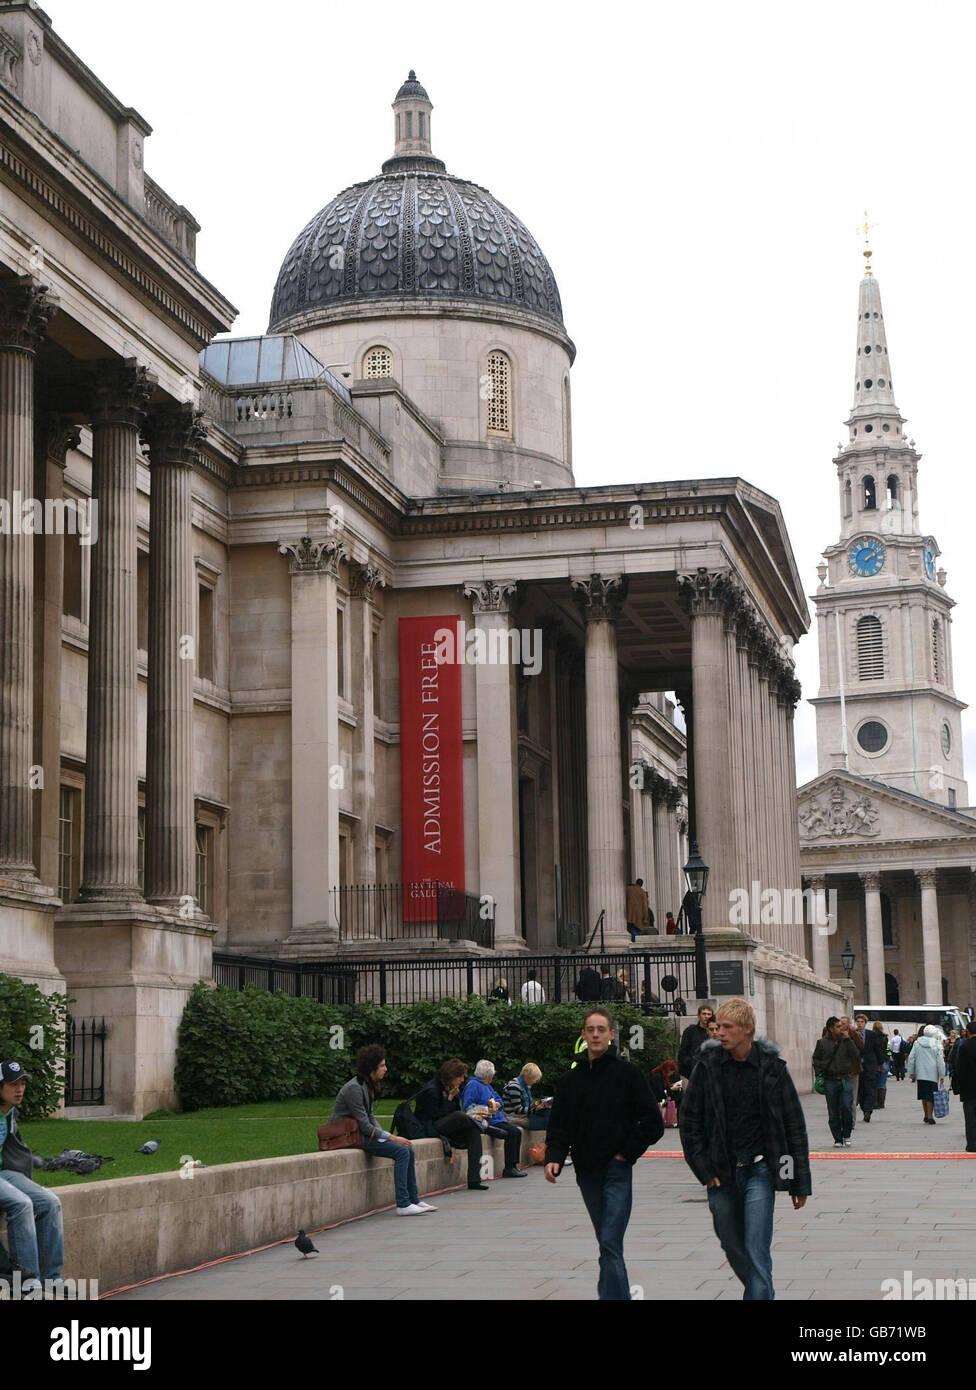 National Gallery staff strike - Stock Image